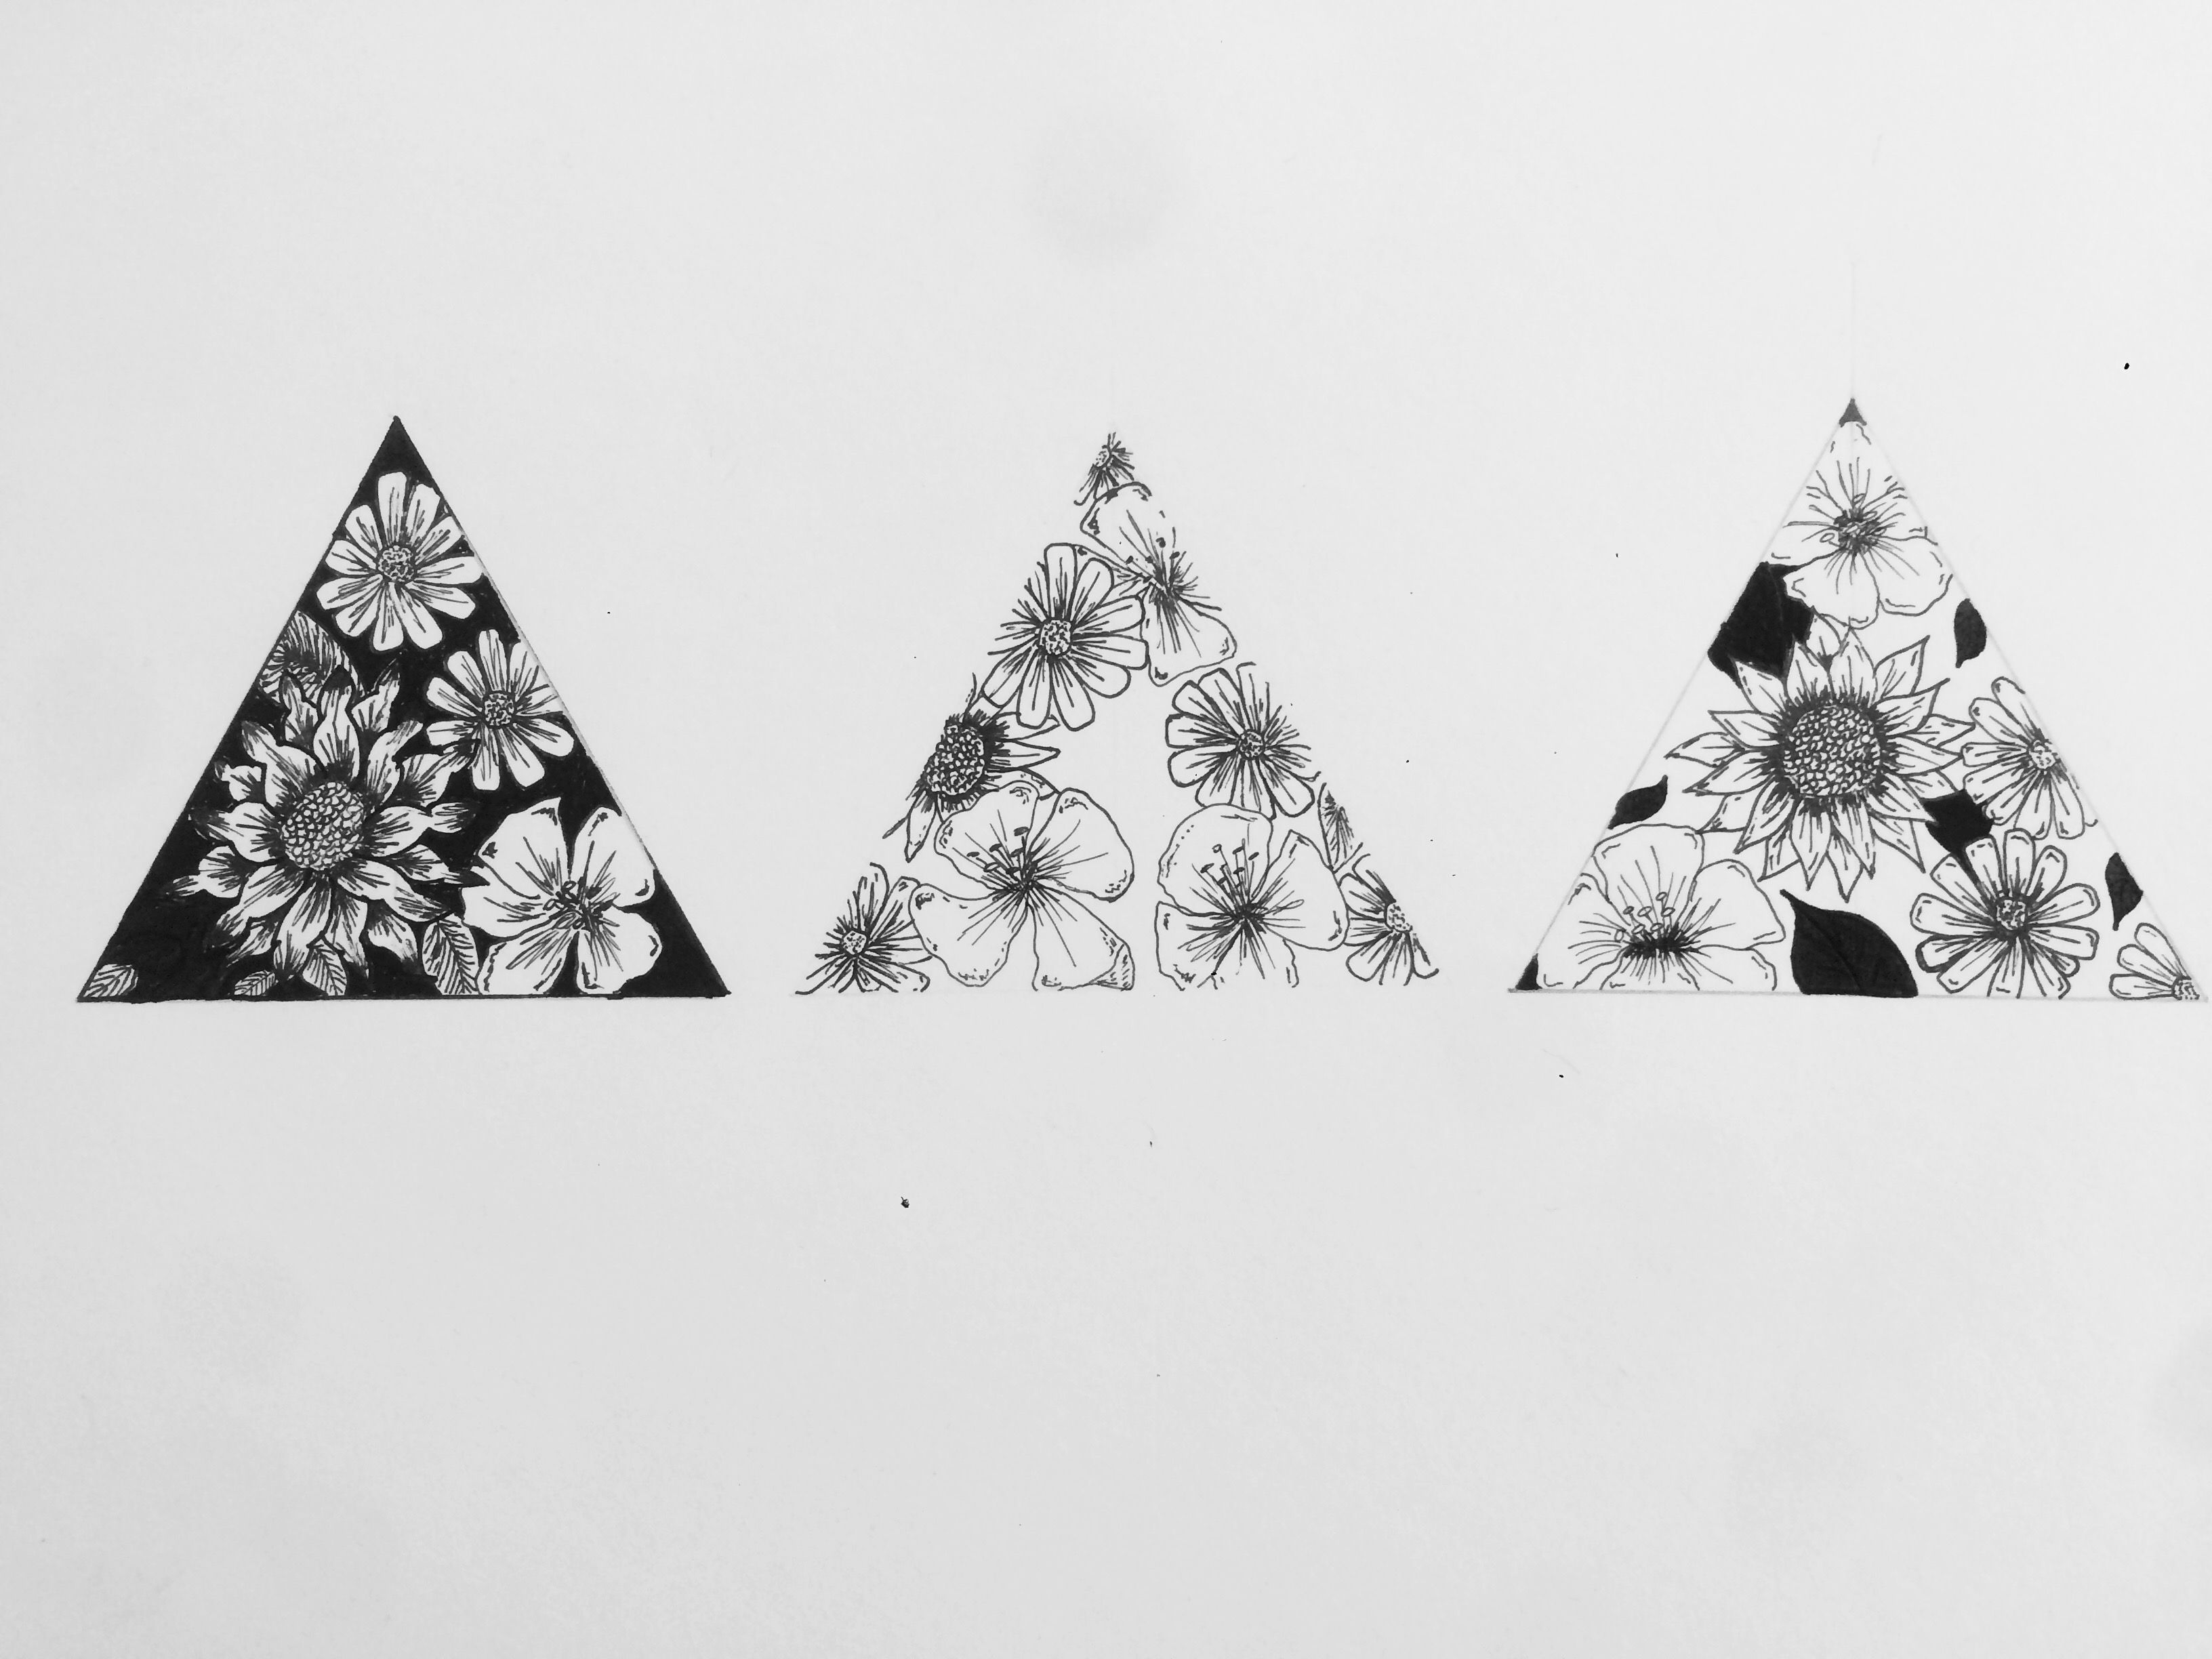 Sunflower Line Drawing : Tattoo drawing geometry blackwork logo flowers triangle